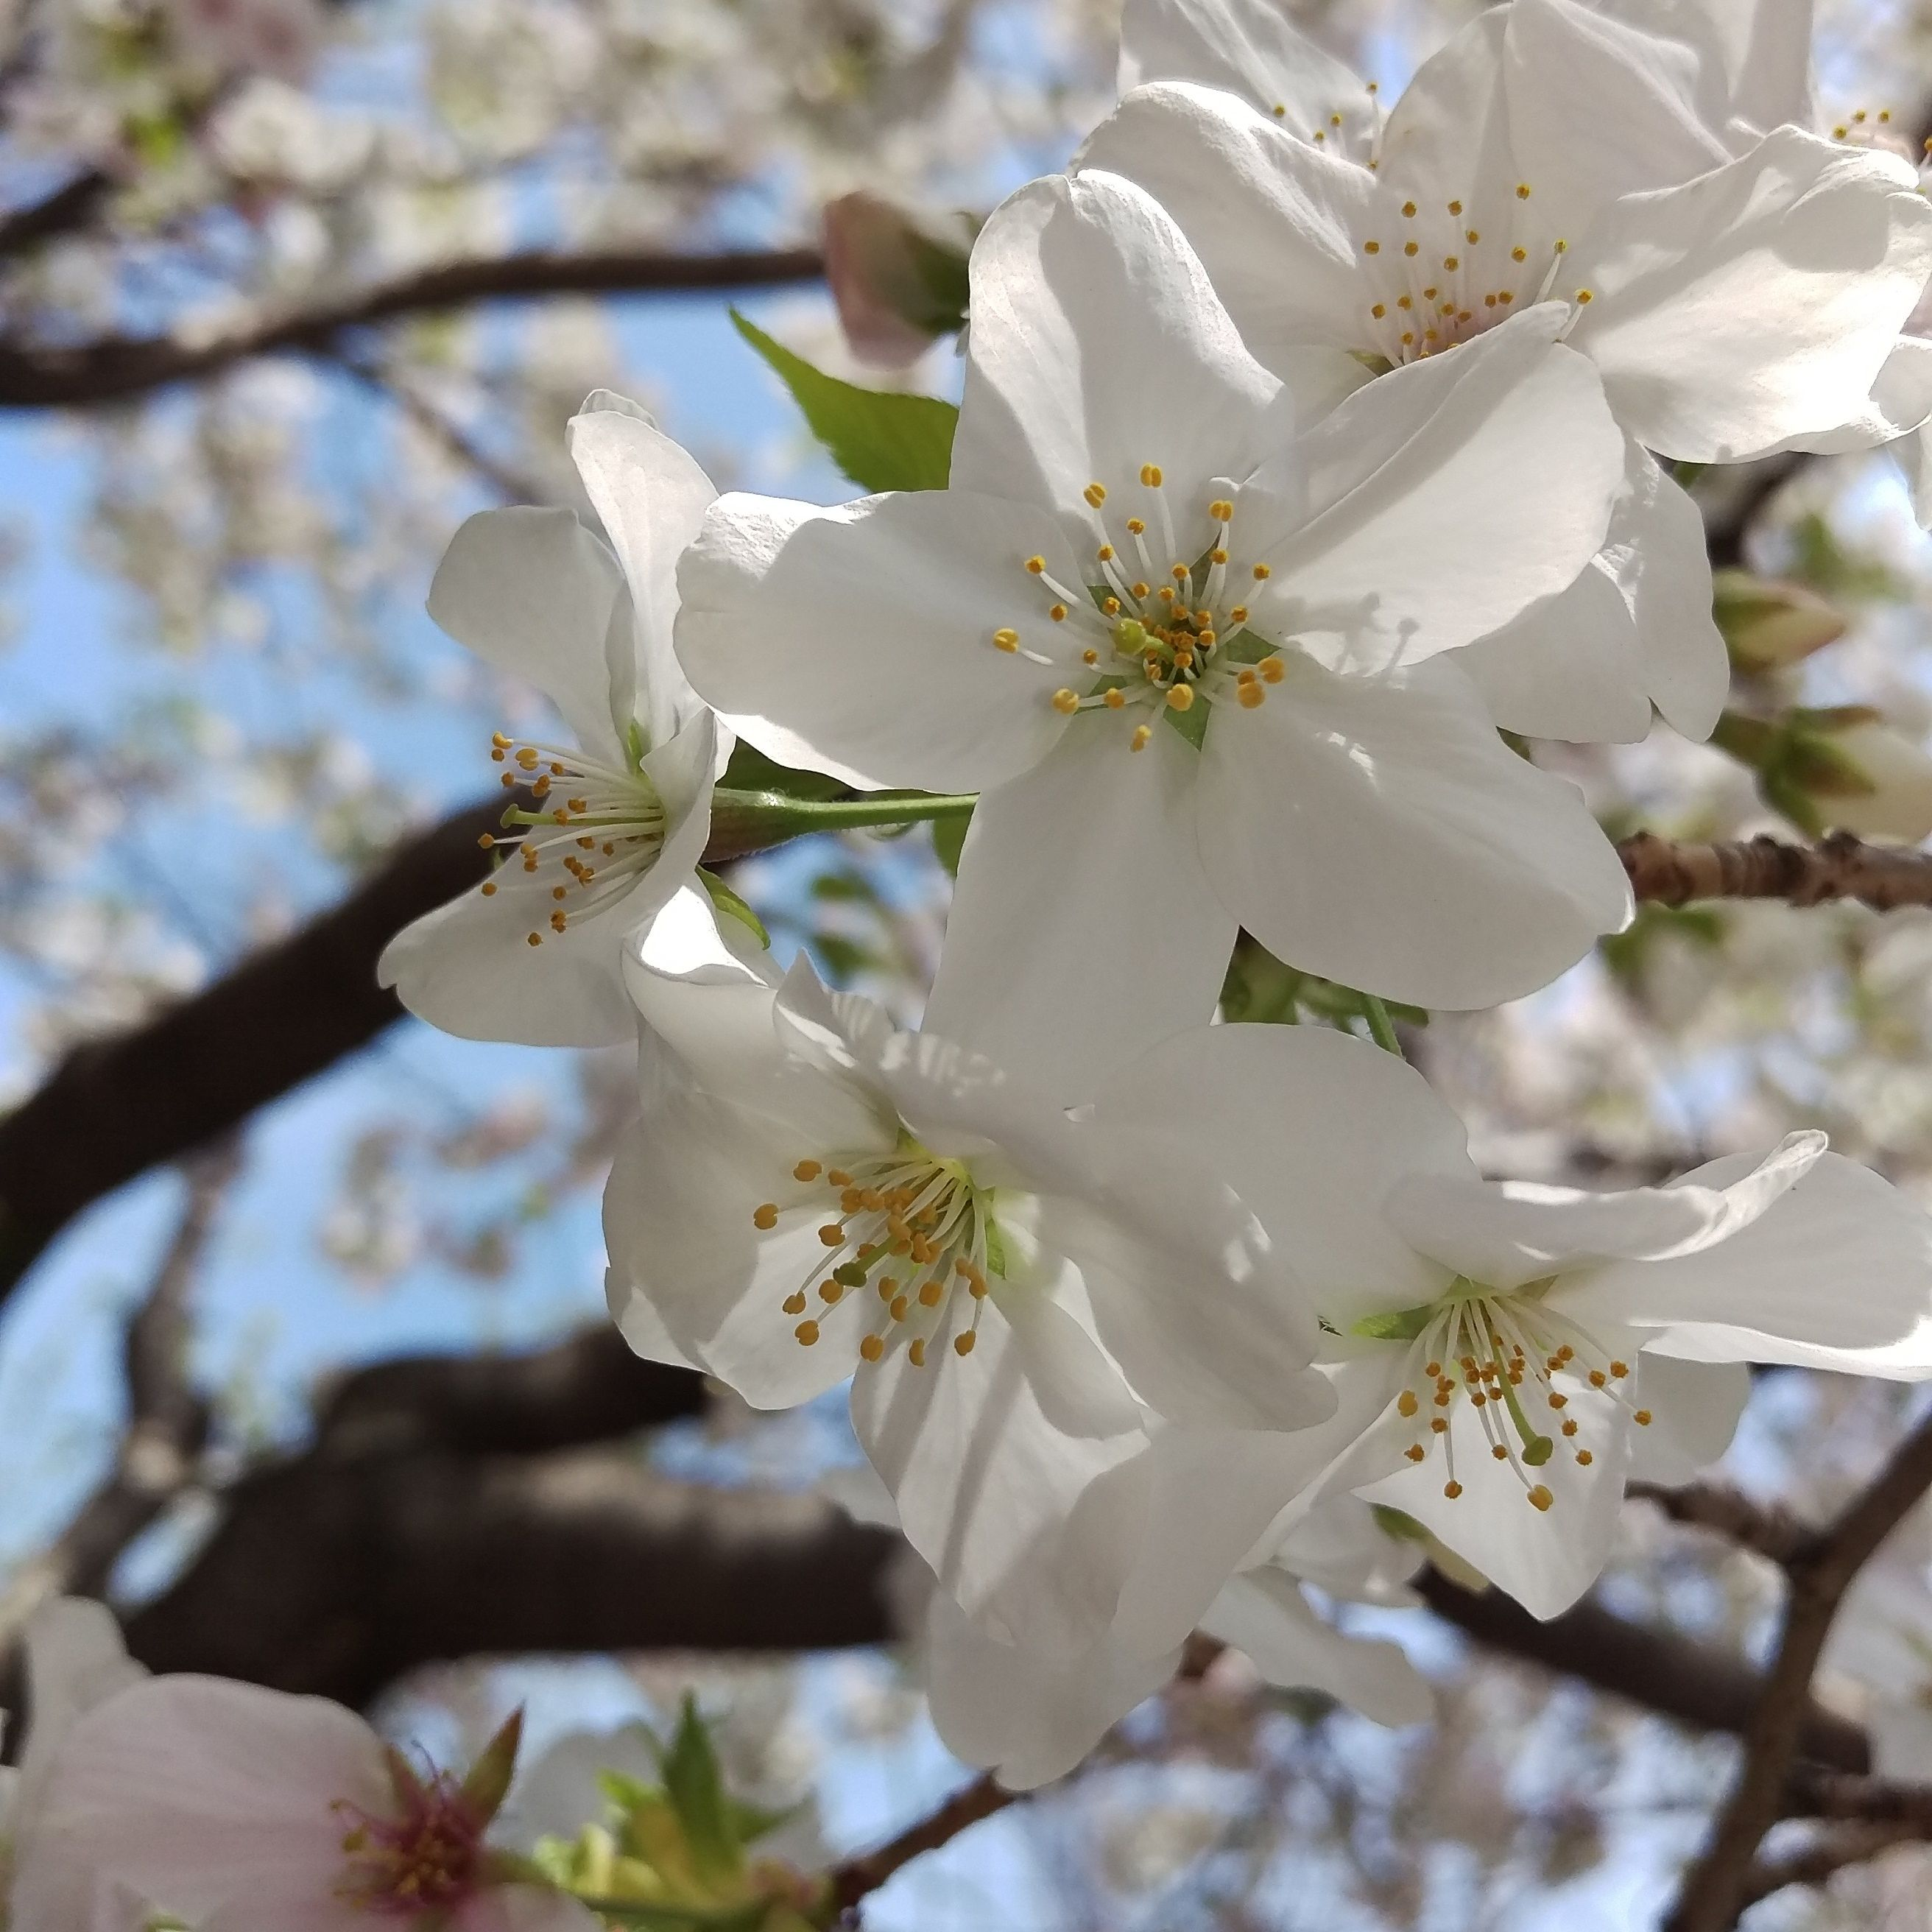 sunlight on petals on my daily life and tagged cherry blossom, flower, japan, matchaatnoon, nature, on my daily life, sakura, sunlight, tokyo, travel, tree, ueno